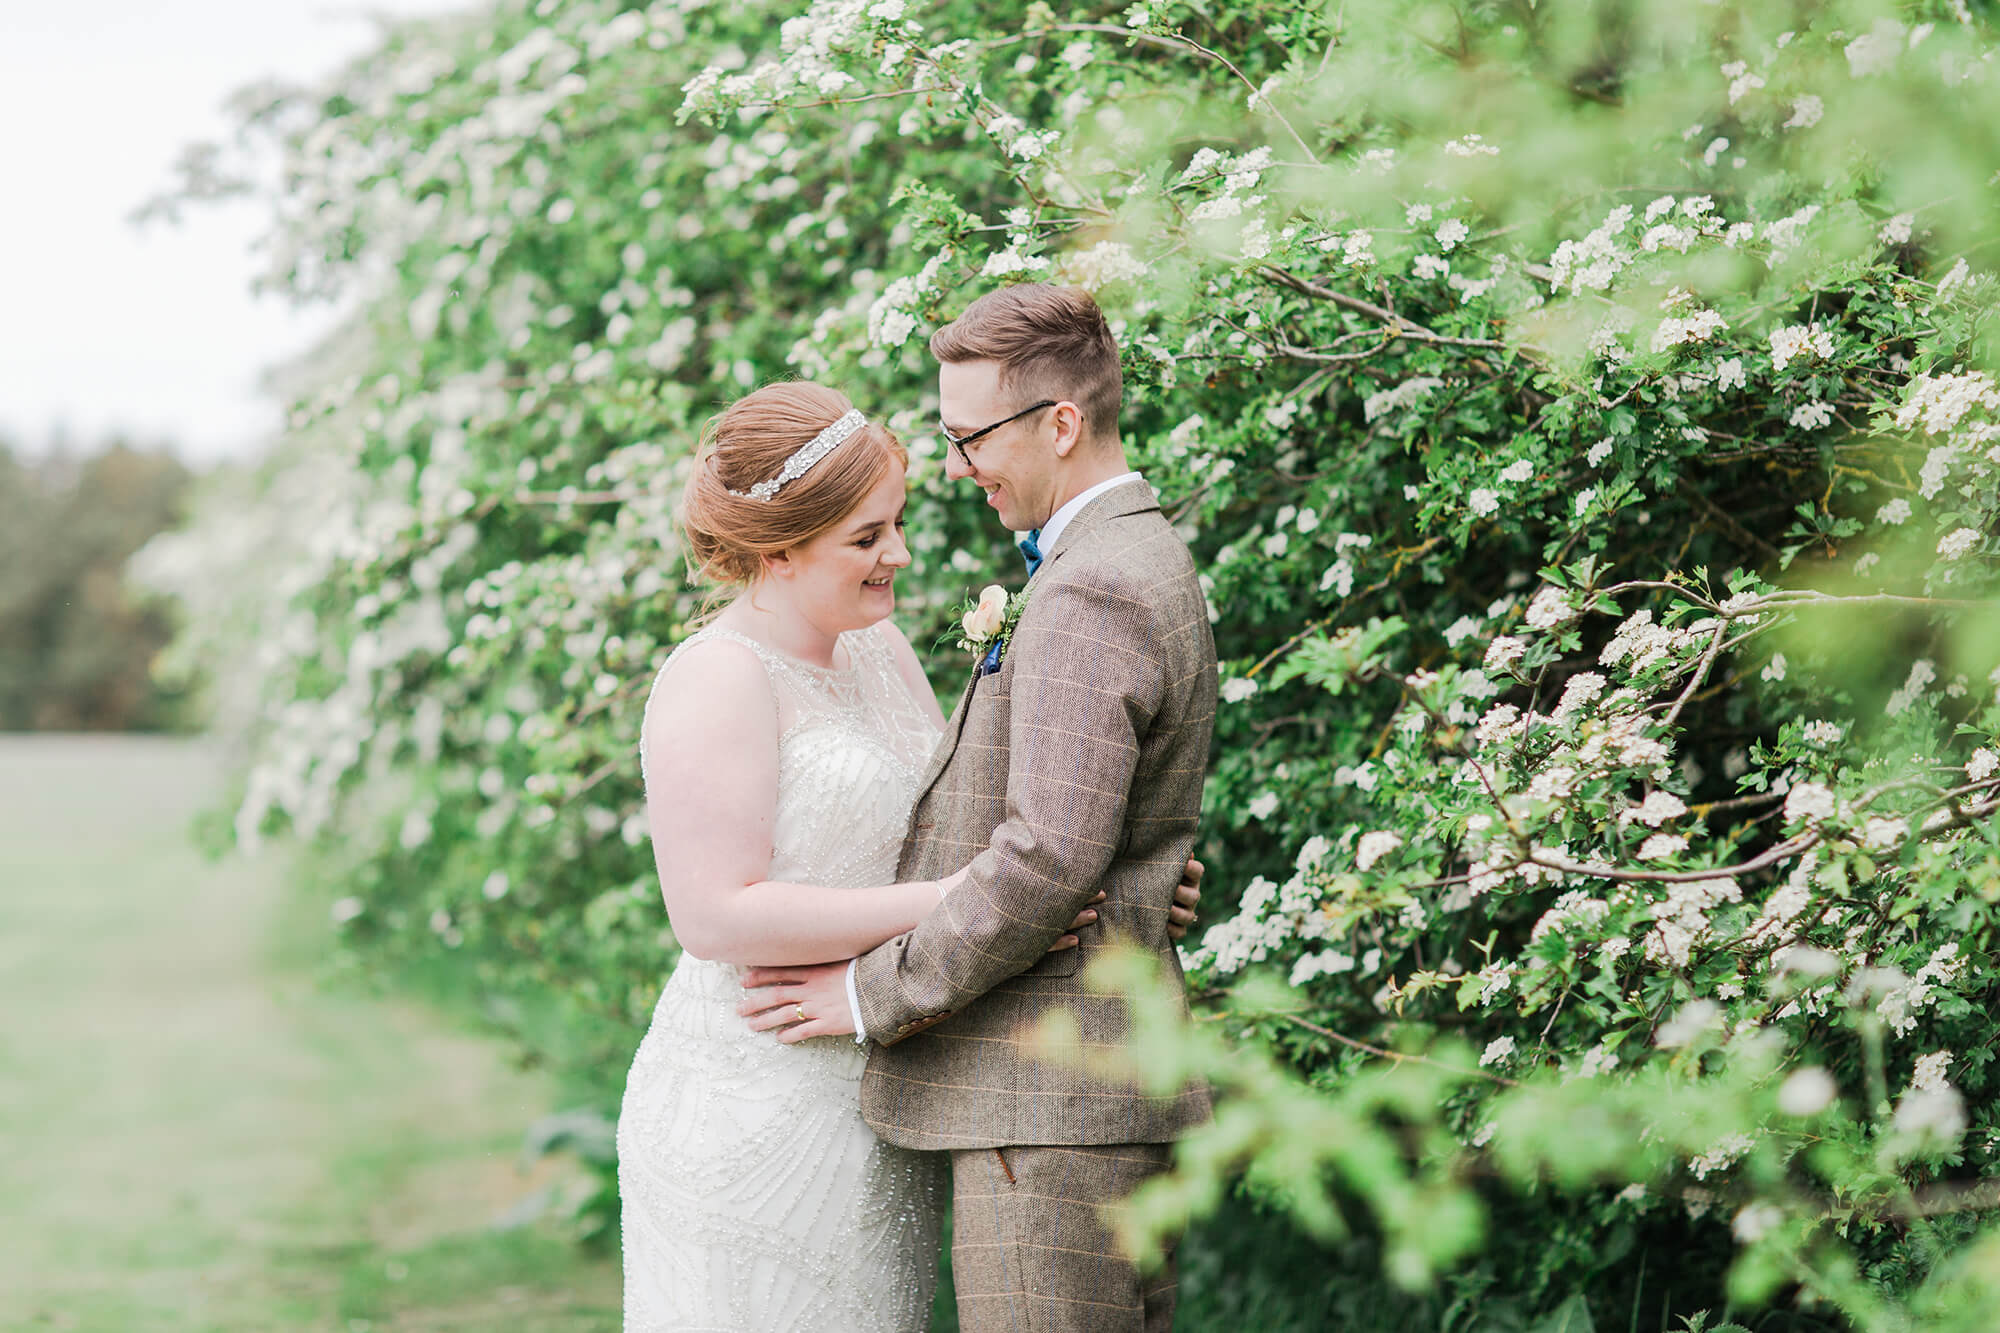 Newly married couple photoshoot